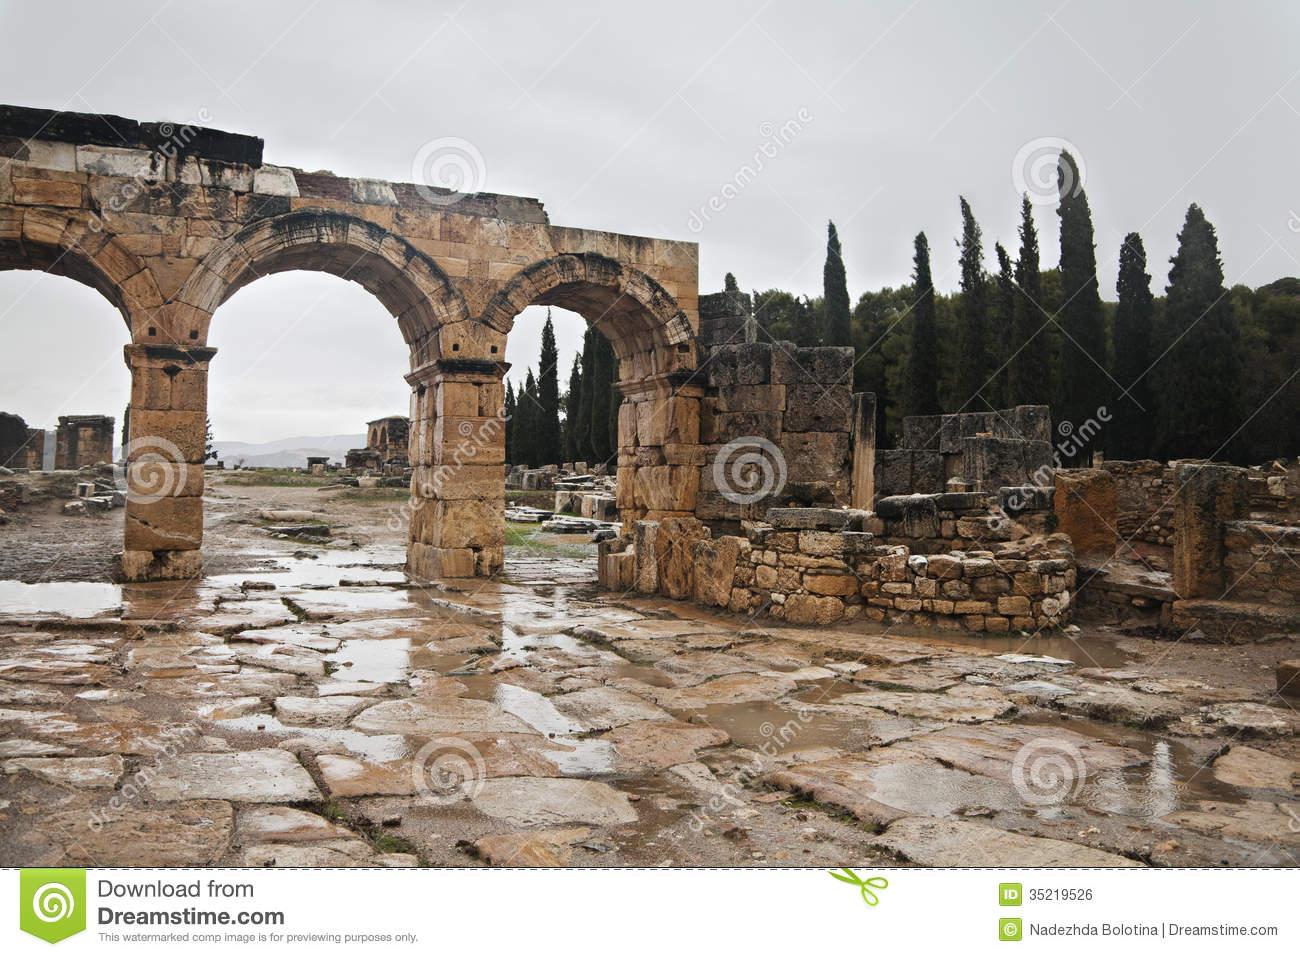 Ancient Ruin In Hierapolis, Turkey Royalty Free Stock Image.